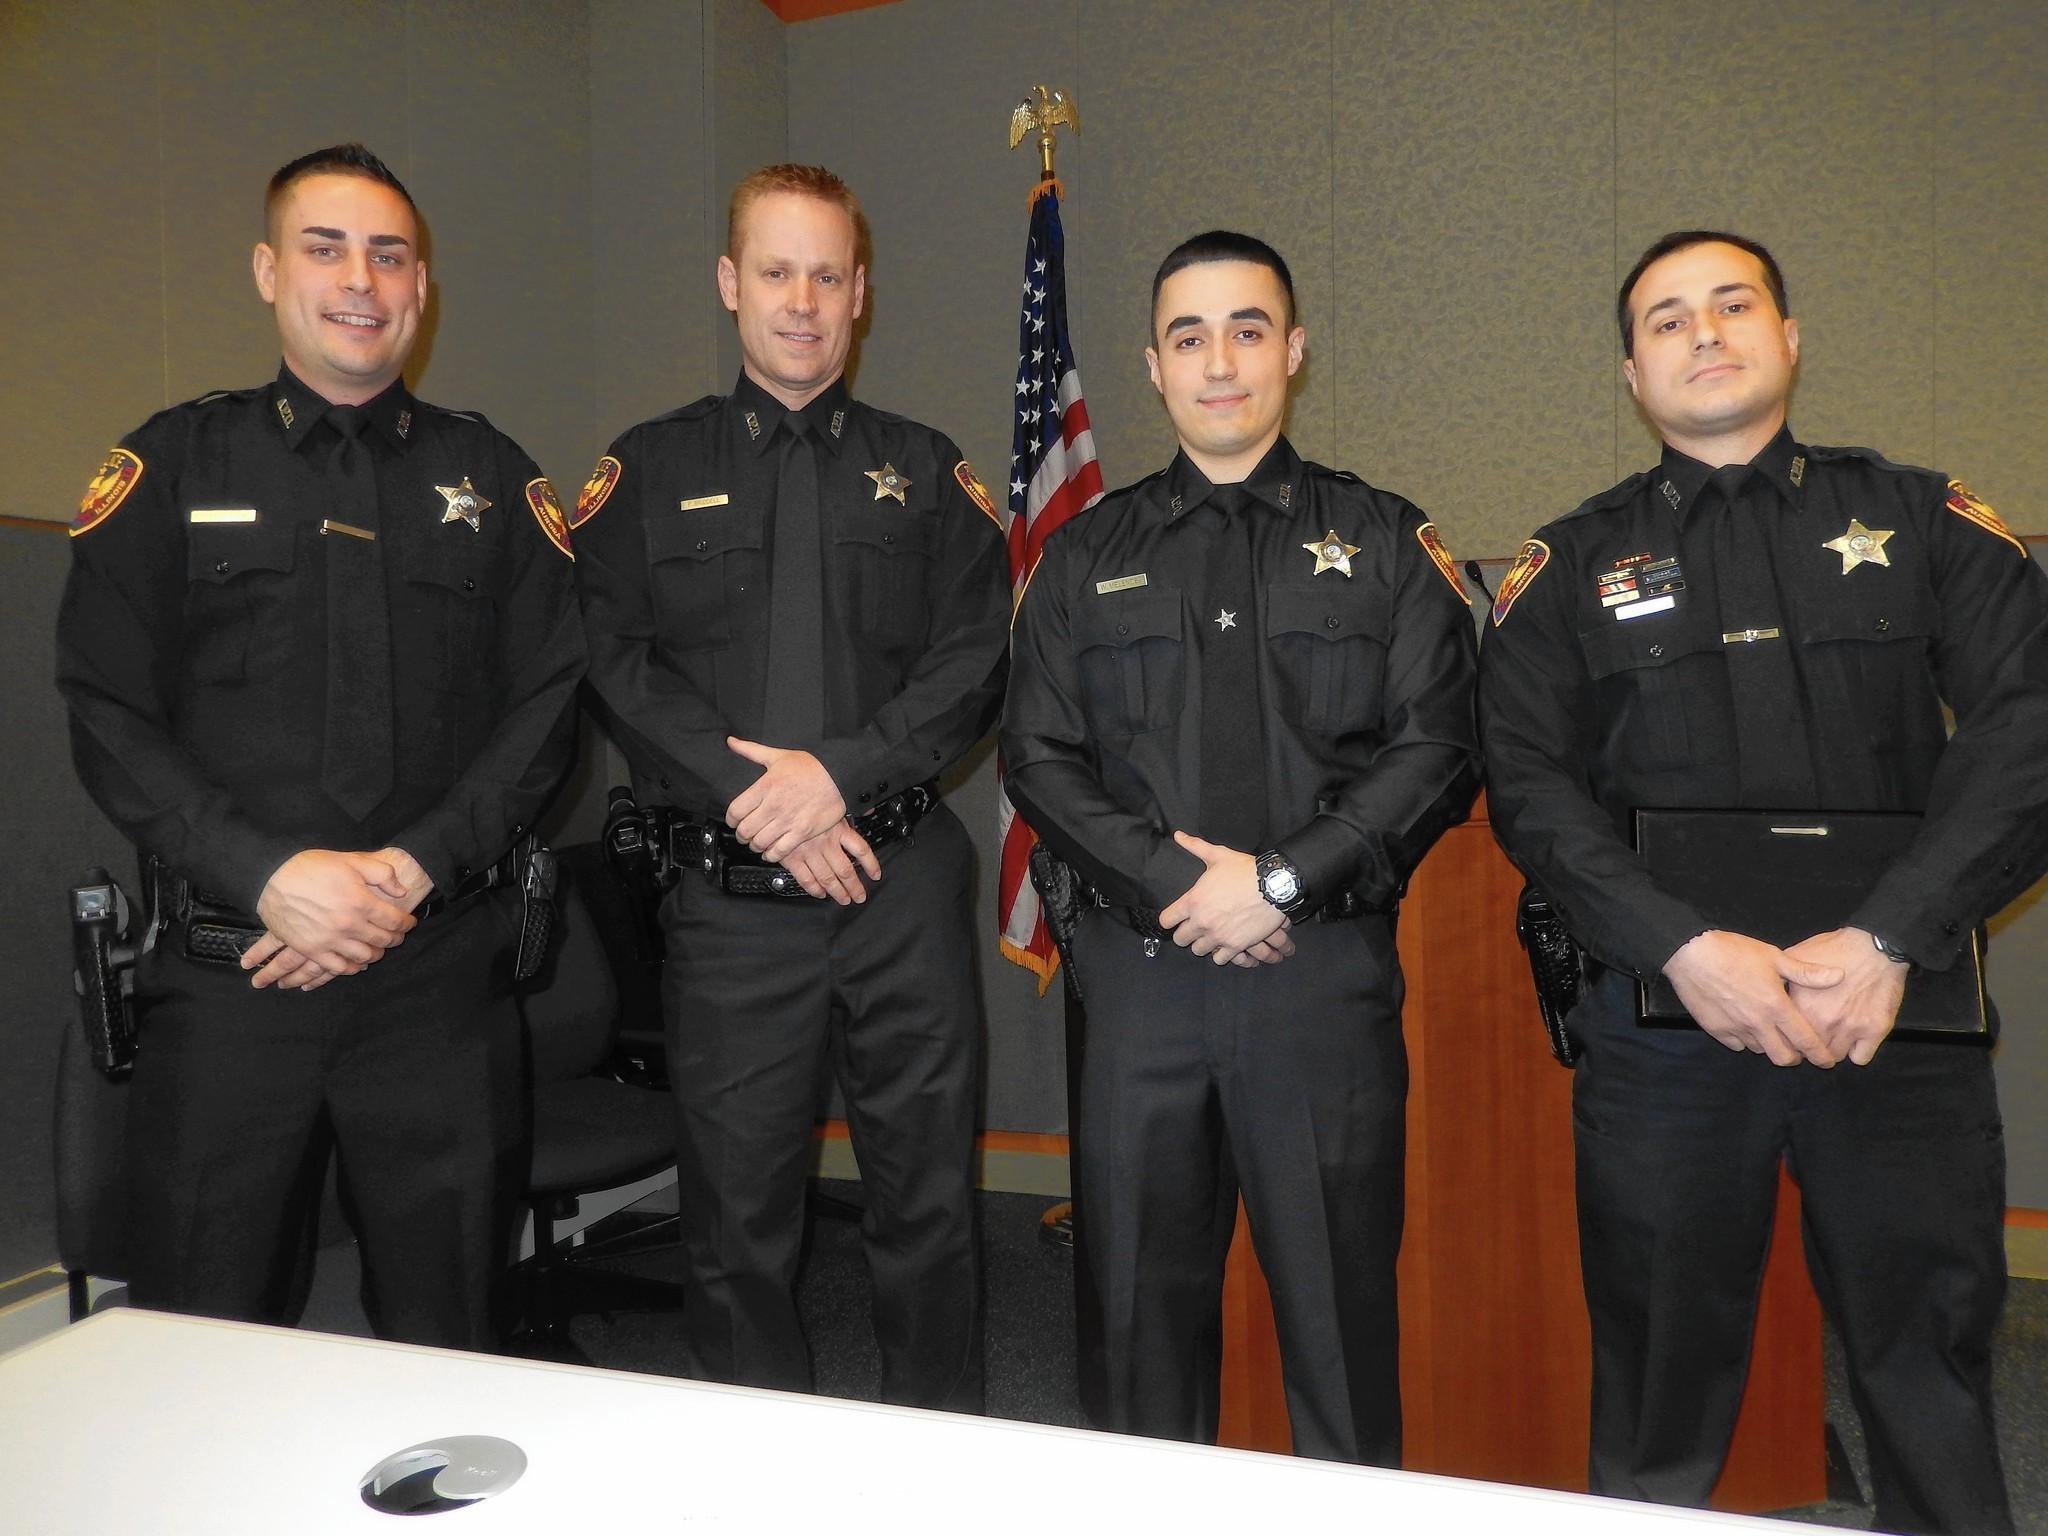 Aurora police honor four men as Co-Employees of Year - Aurora Beacon-News f5c360c254